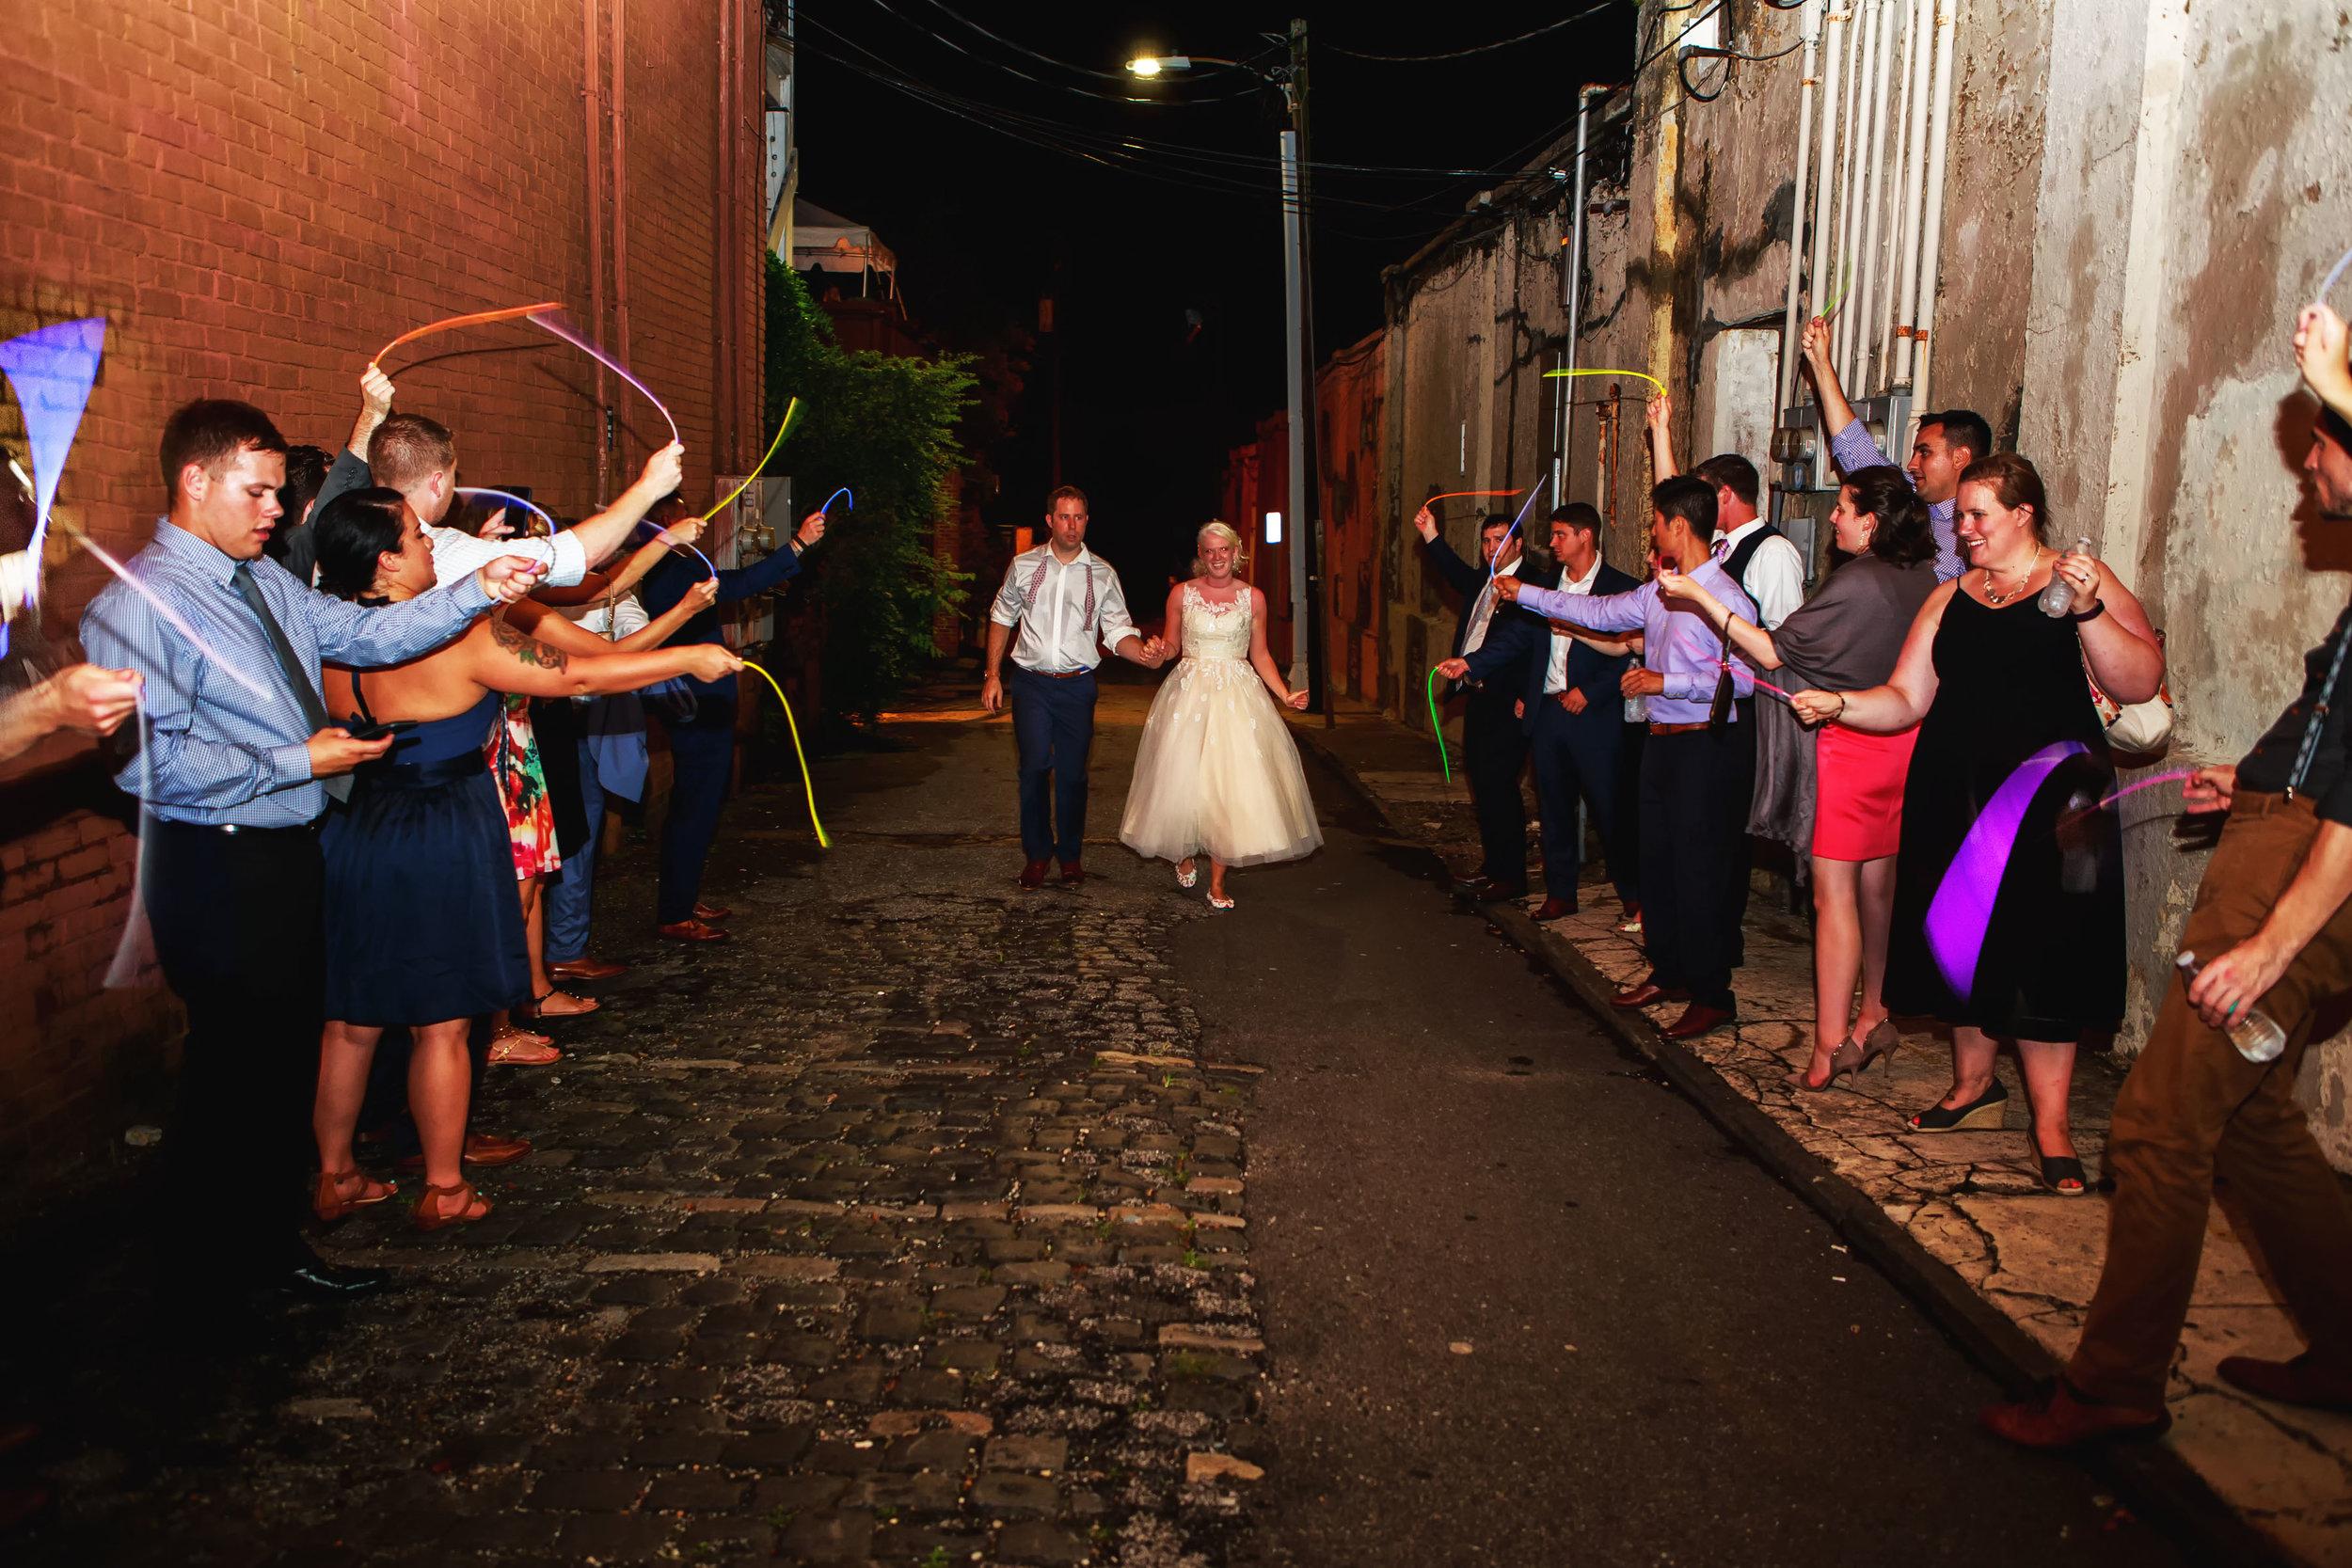 128-South-Wedding-Wilmington-NC-Photographer-Reception-275.jpg